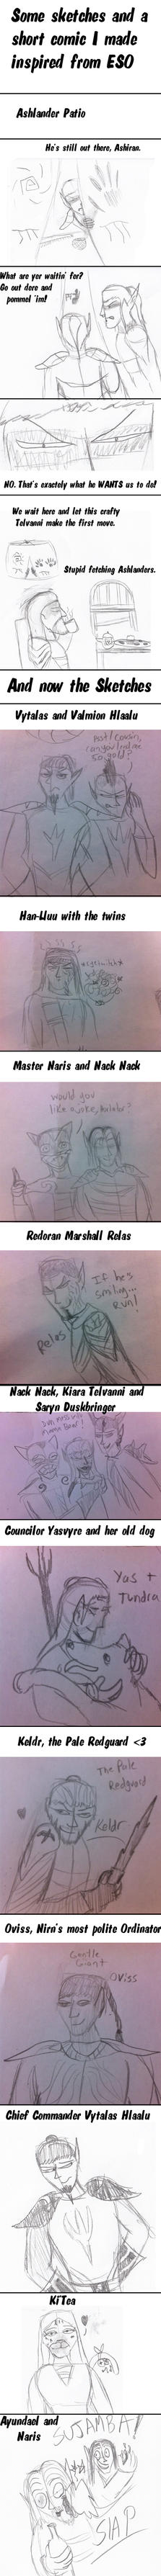 Elder Scrolls Online Sketch Dump by gangyzgirl